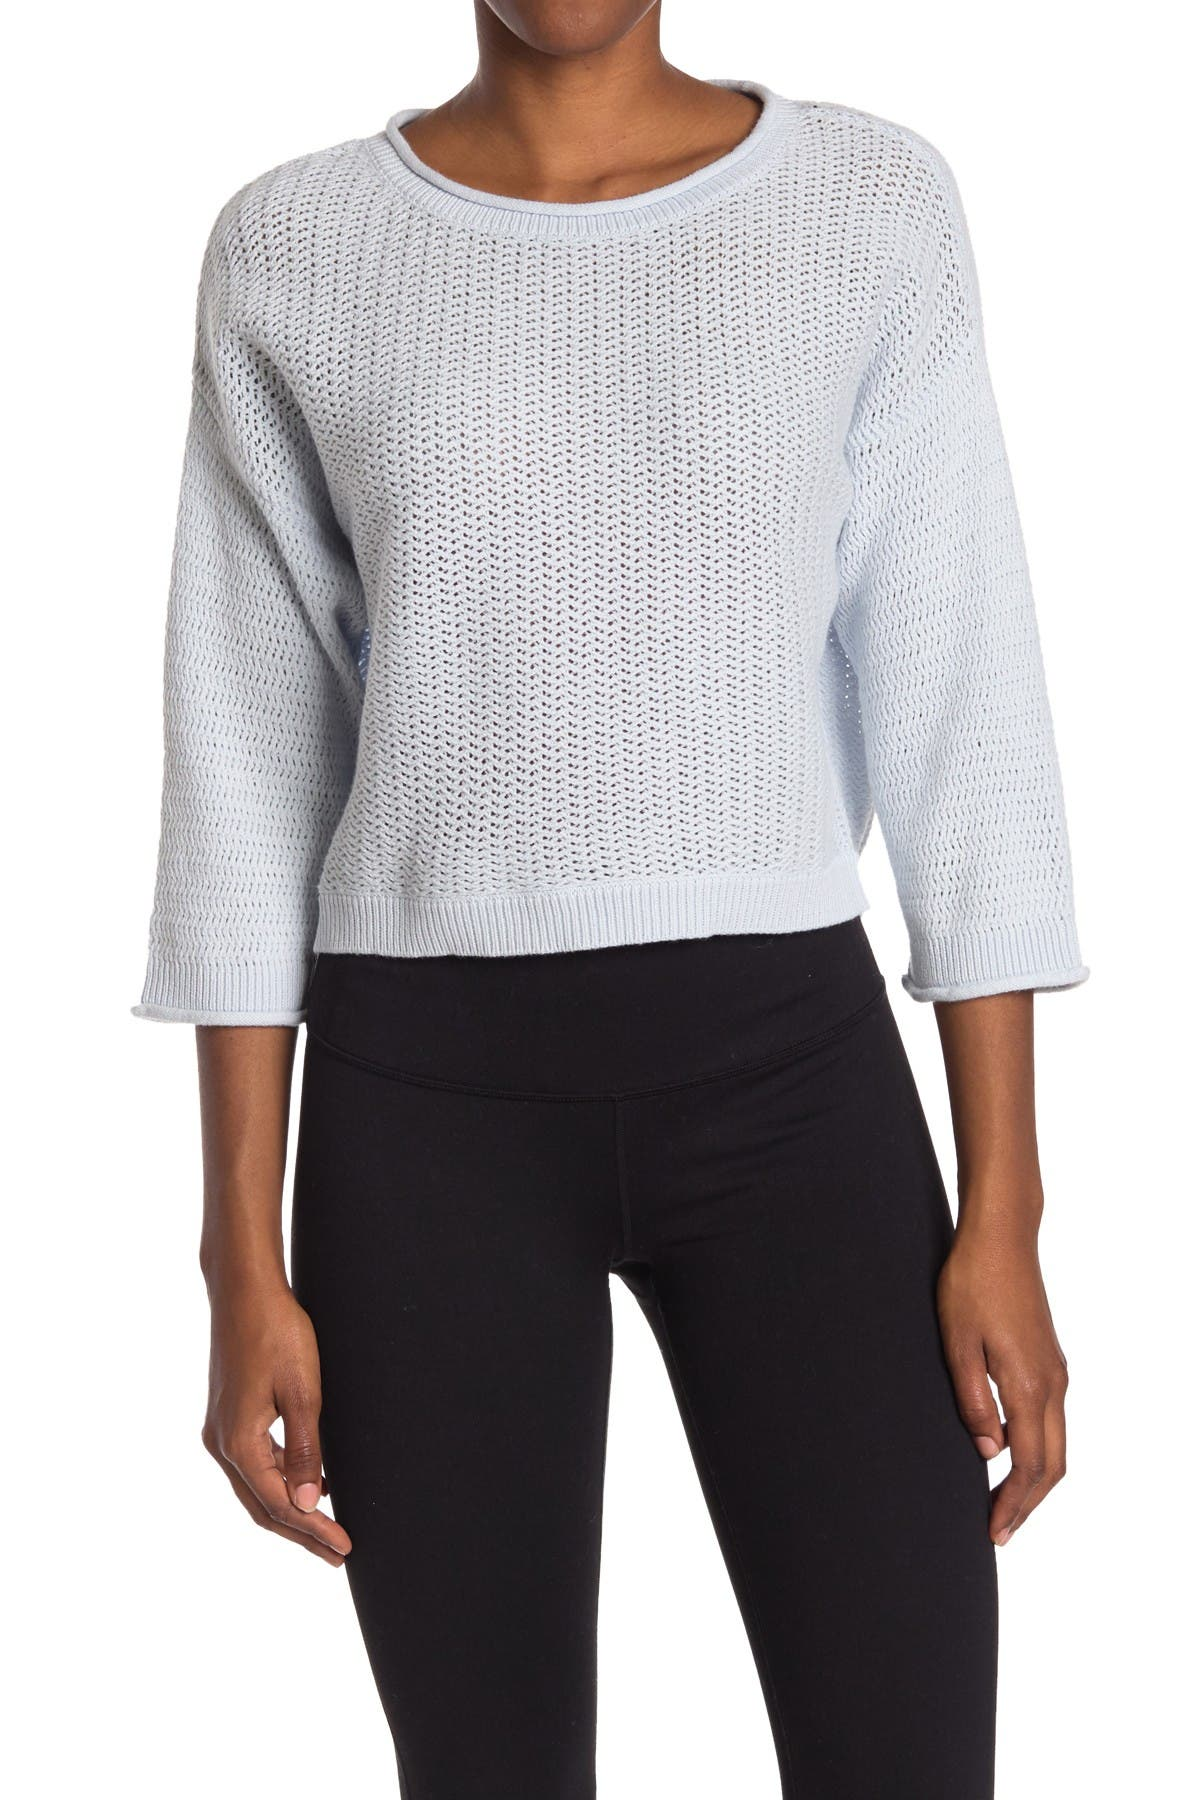 Image of New Balance Cropped Sweater